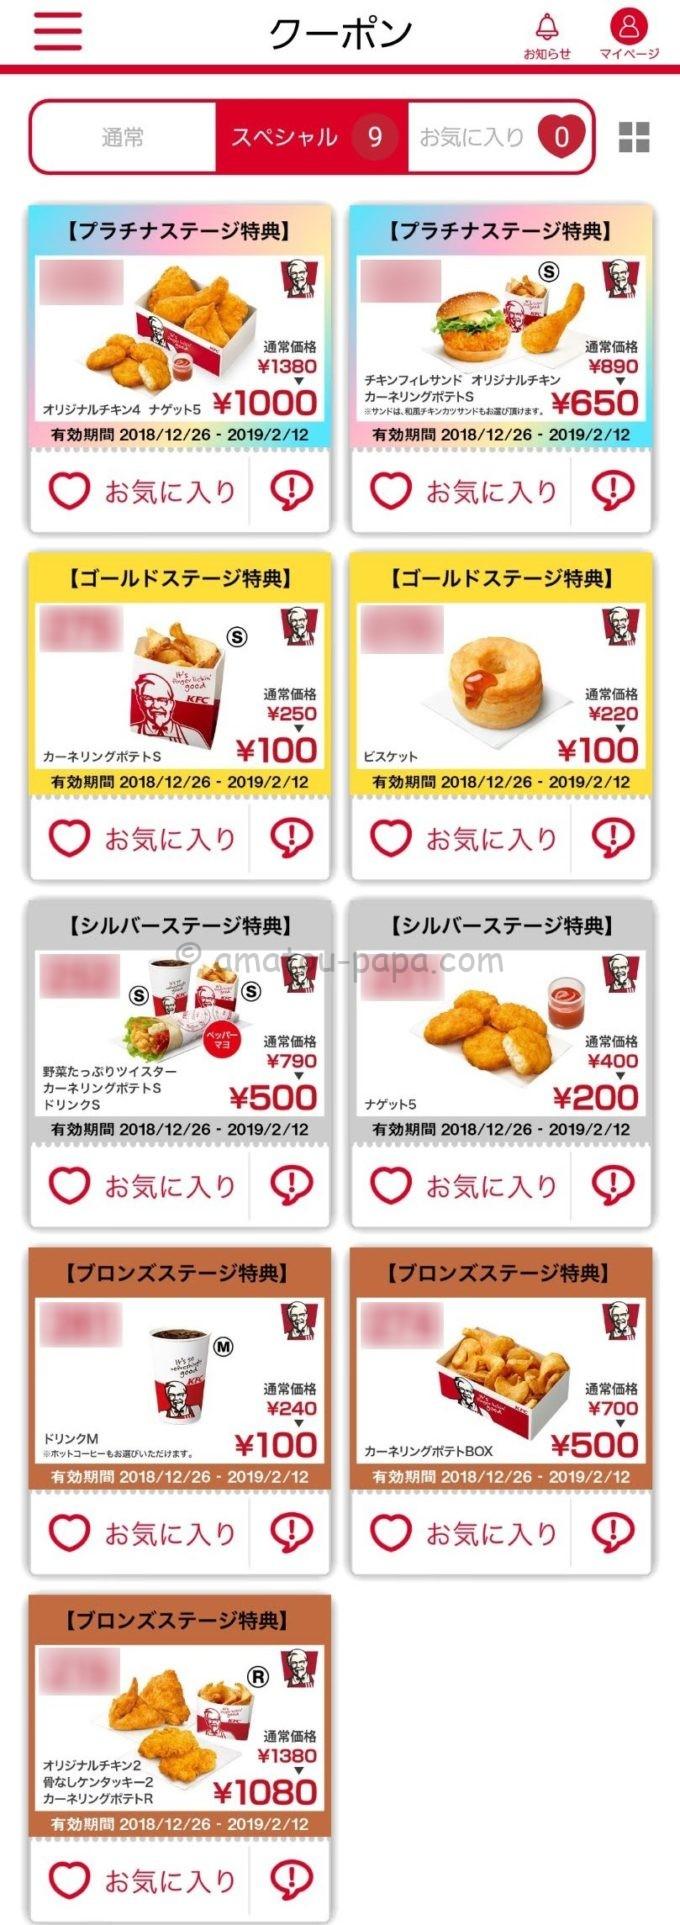 KFCマイレージプログラム全ステージのスペシャルクーポン一覧